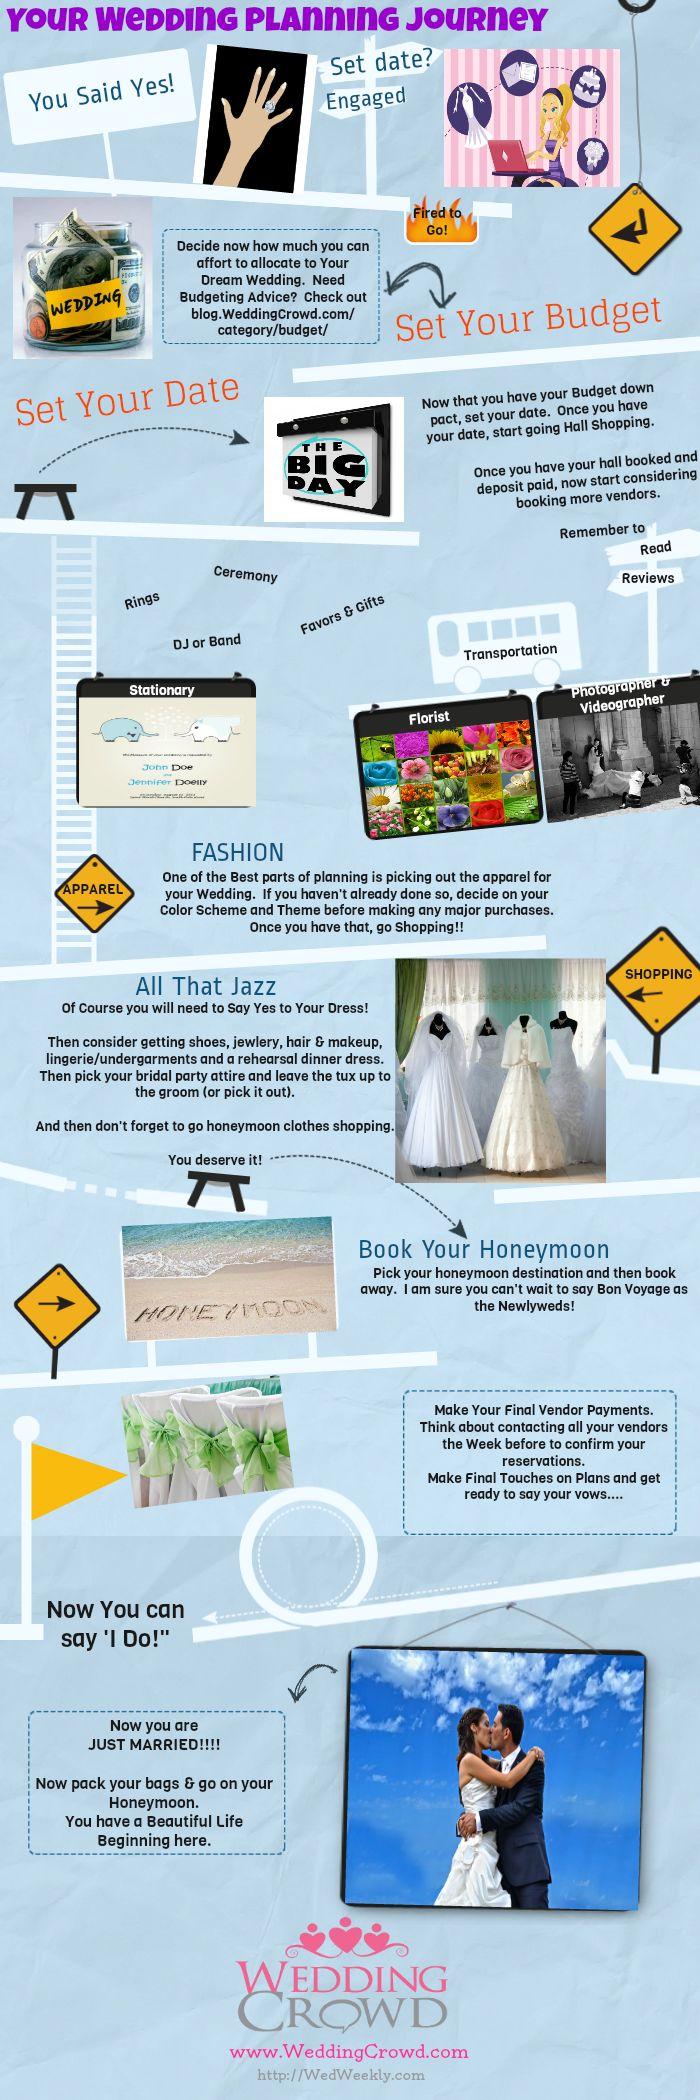 wedding planning journey